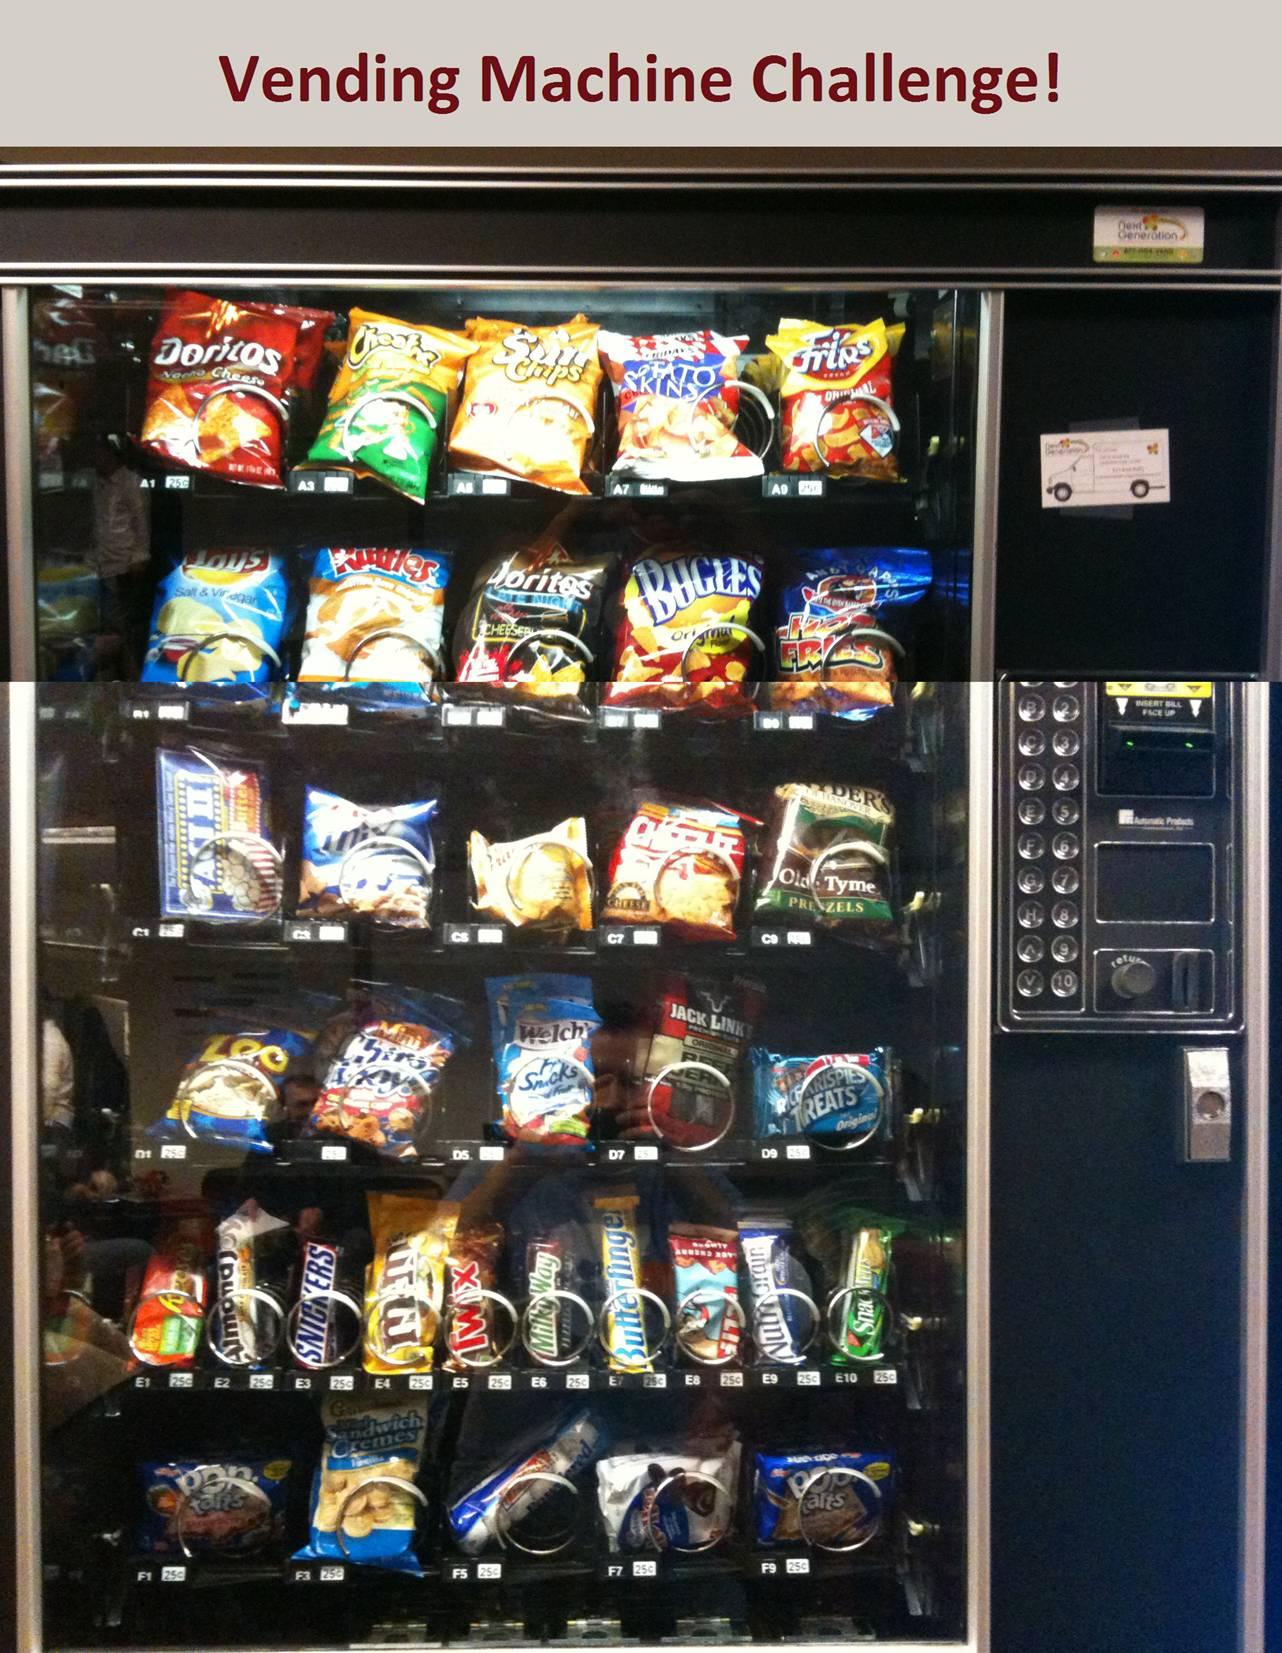 The Vending Machine Challenge!